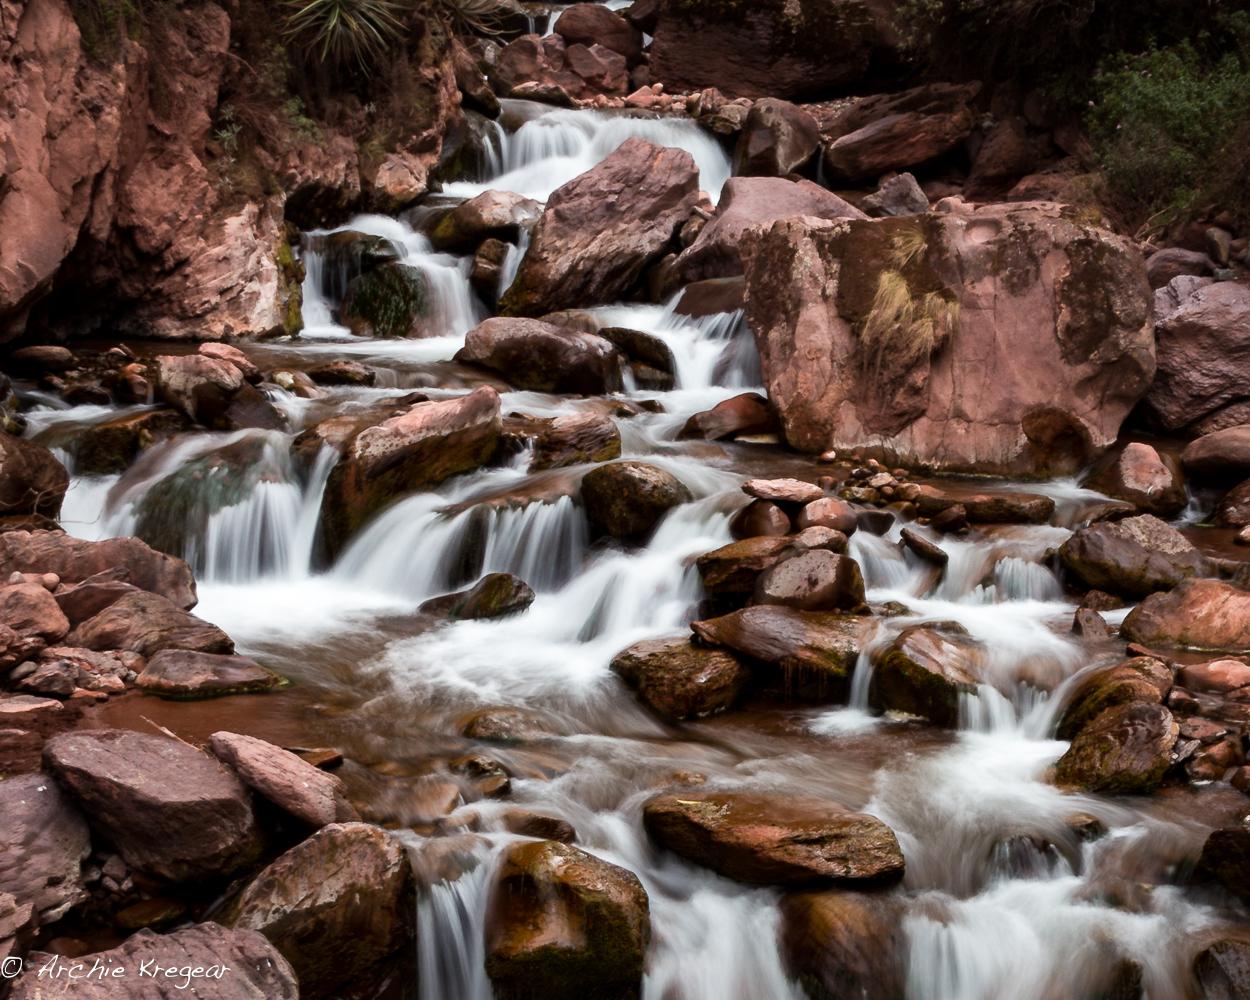 Red river rocks